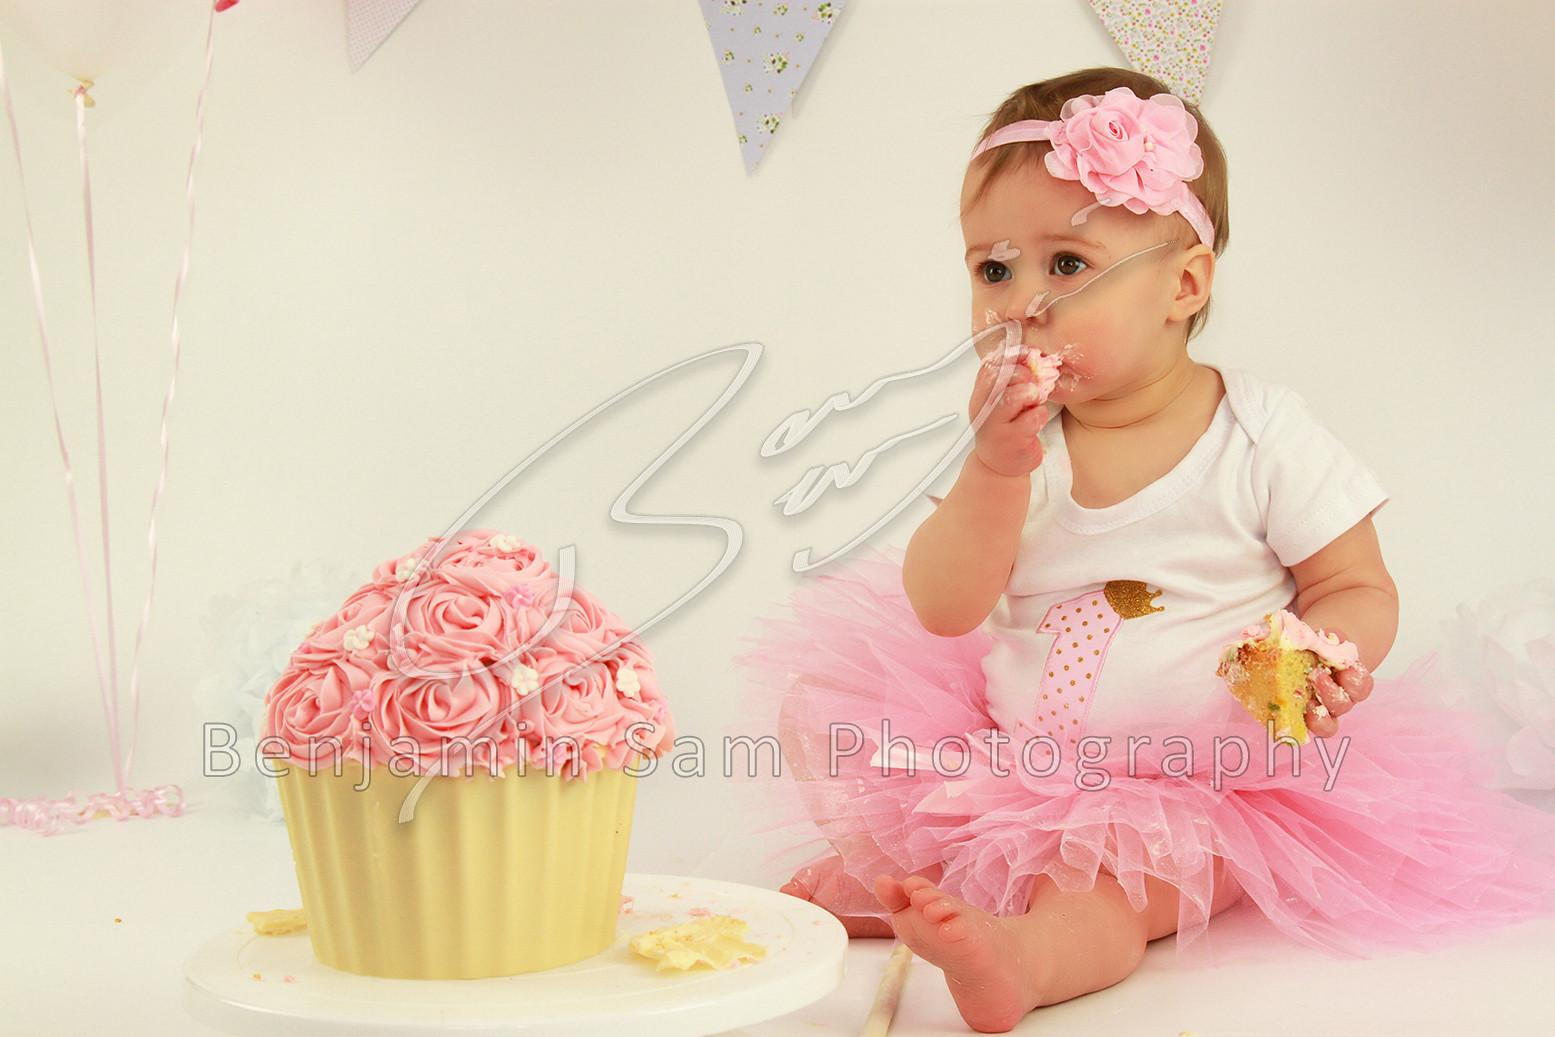 Cake - WM - 002